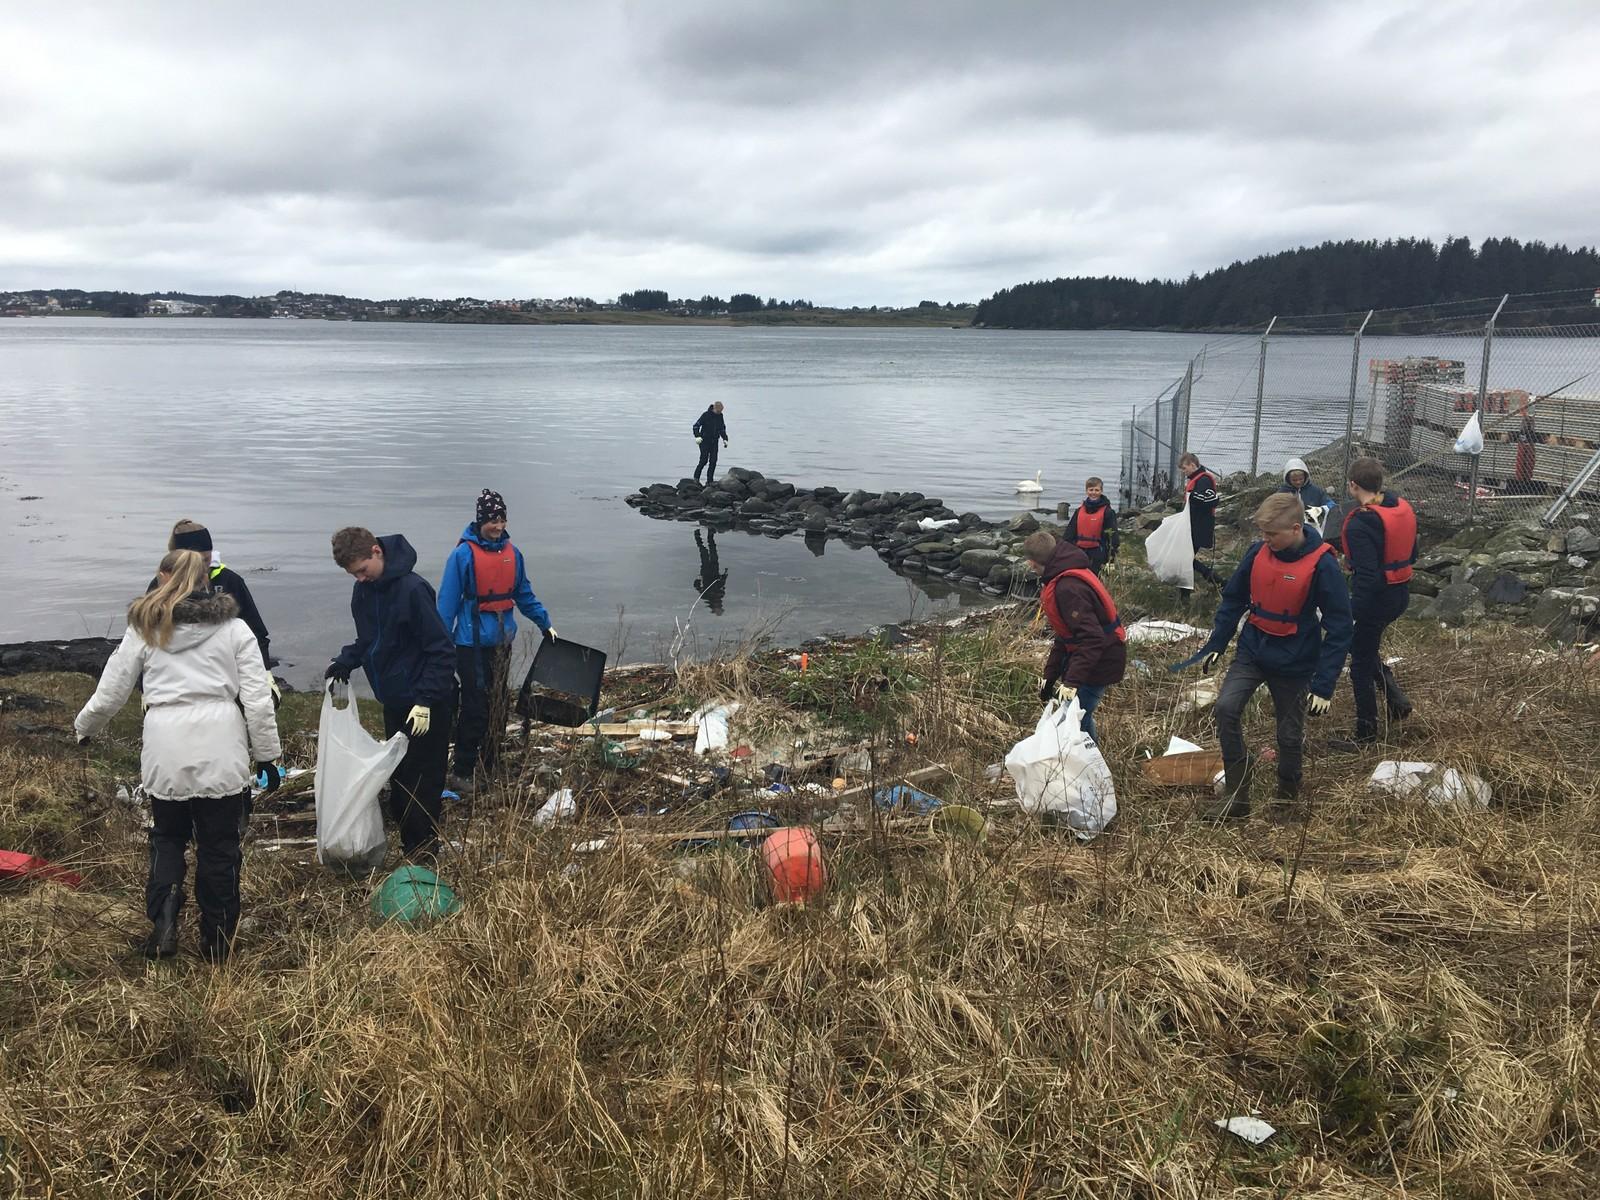 9. klassingener på Vormedal skole har natur, miljø og friluftsliv som valgfag, og er ute i naturen hver torsdag. Torsdag plukka de søppel rett nord for FMC.